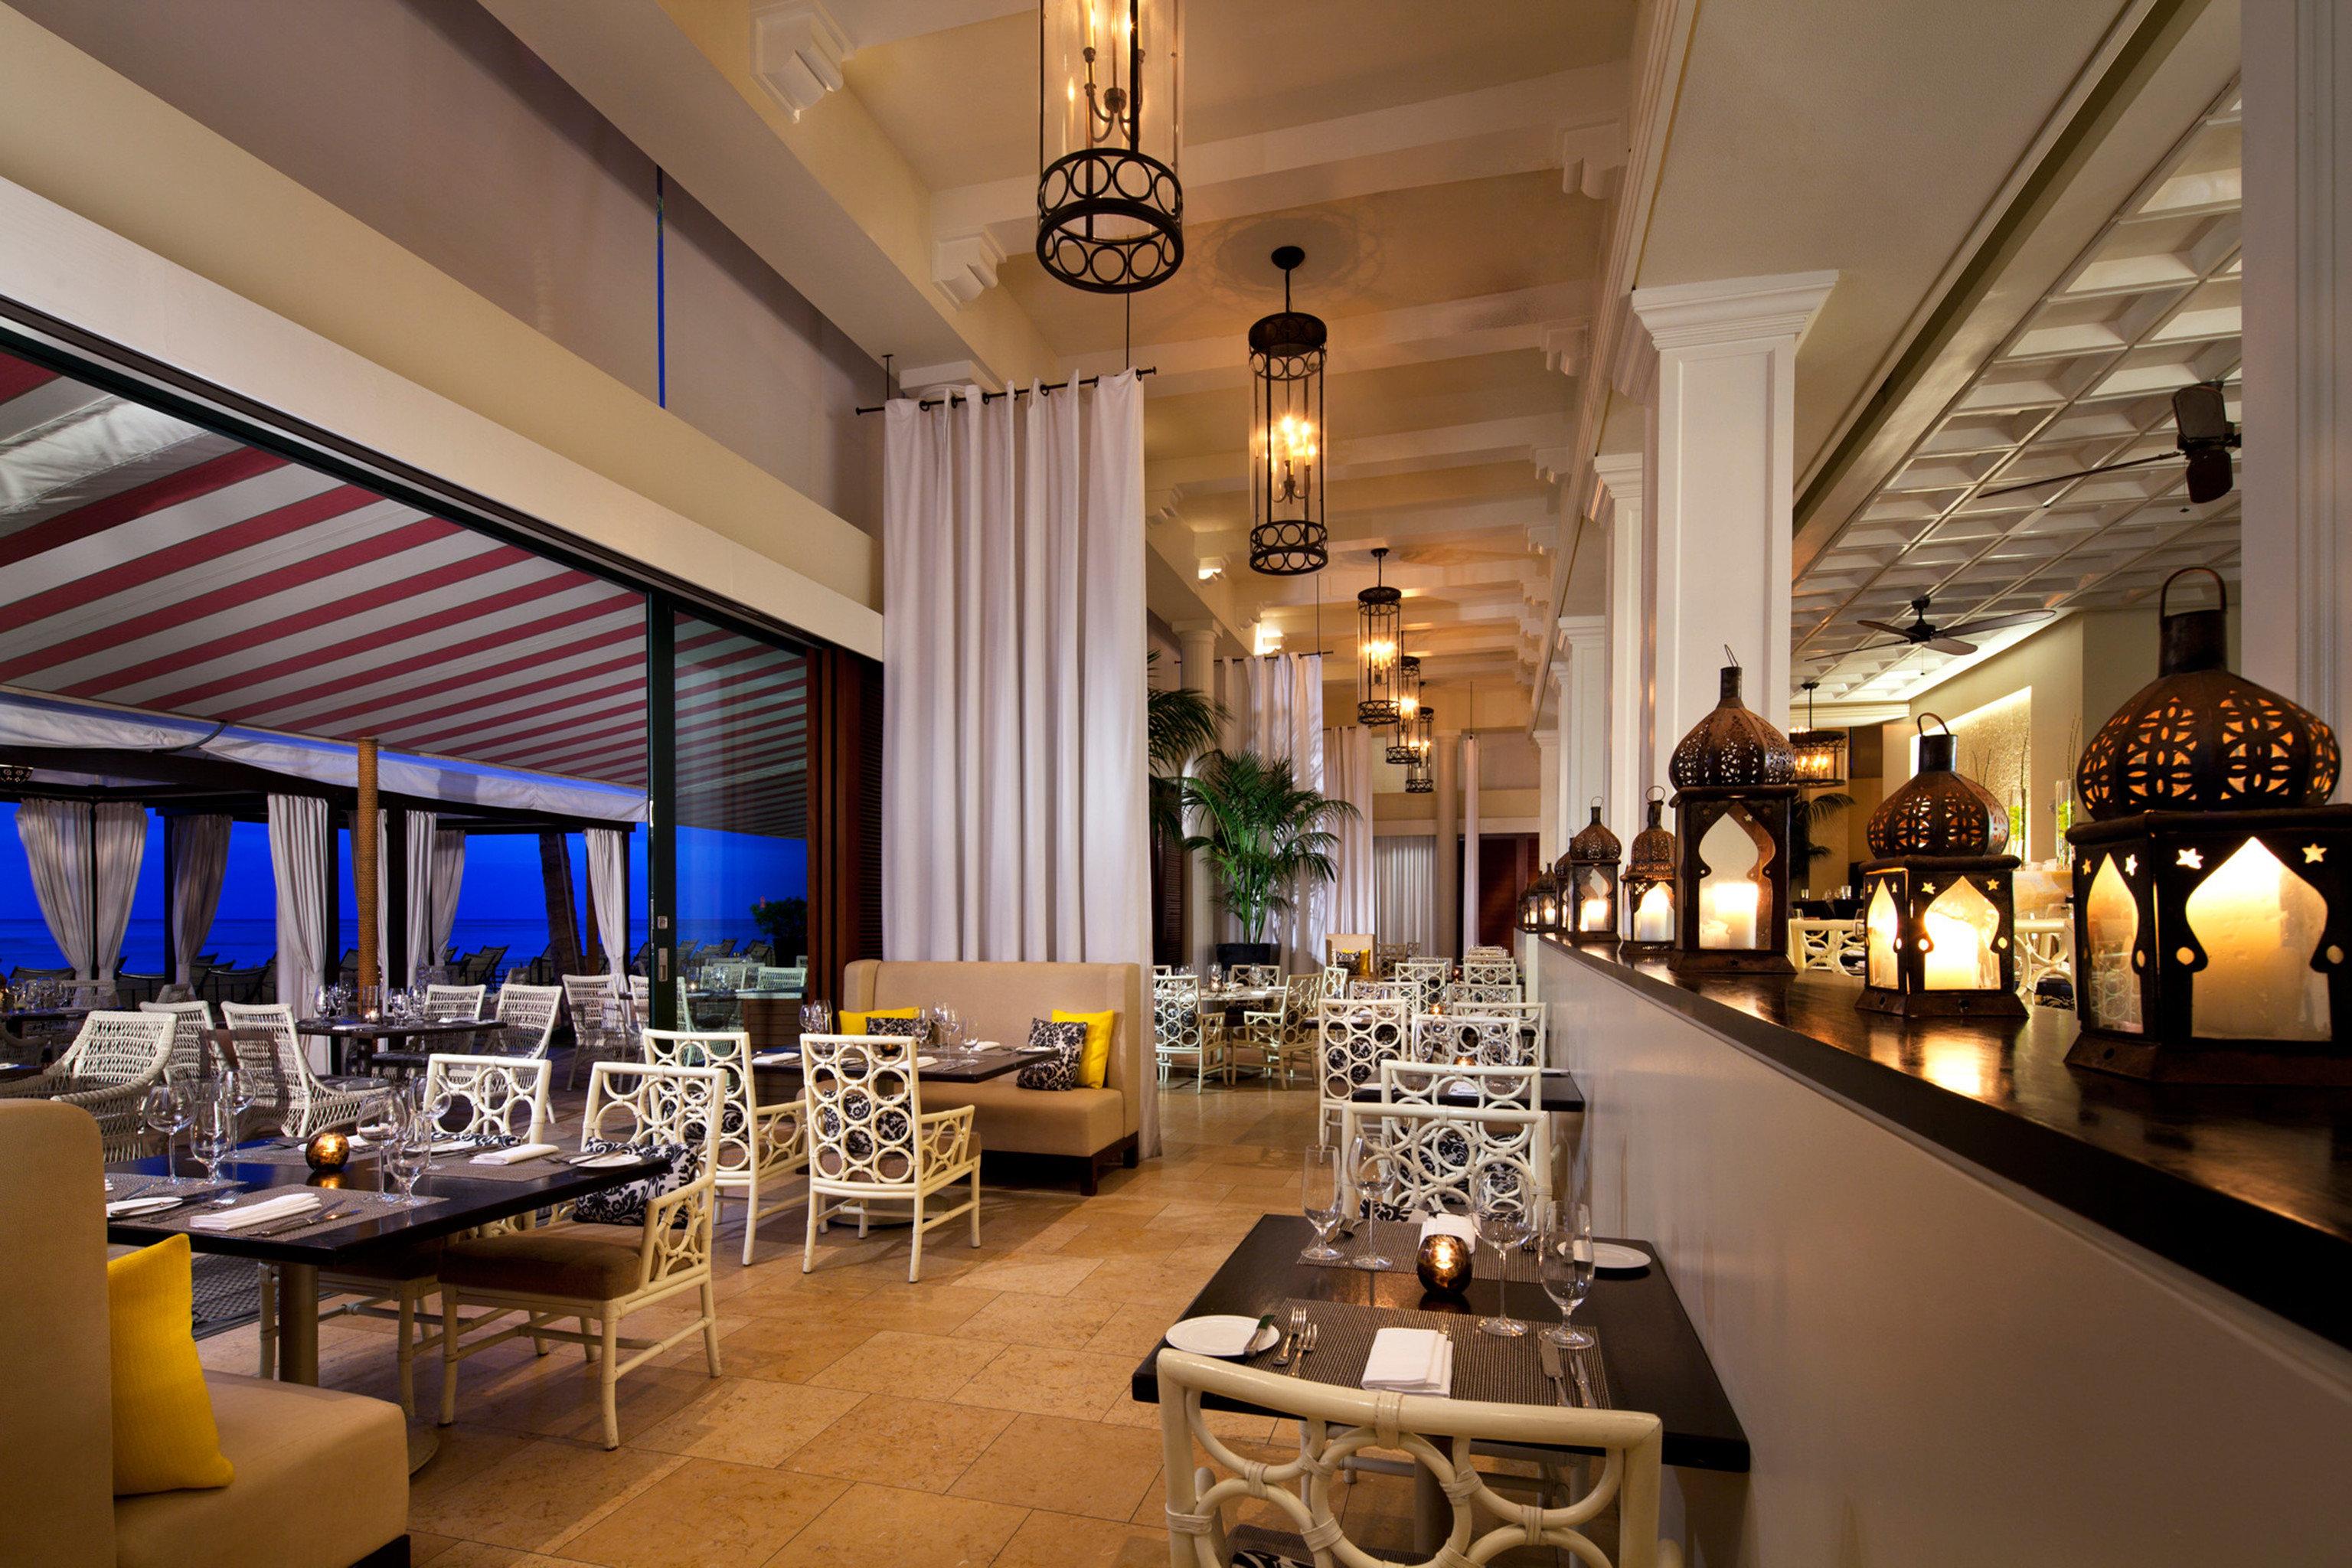 Boutique Hotels Hawaii Honolulu Hotels restaurant function hall Lobby Dining ballroom Bar Island